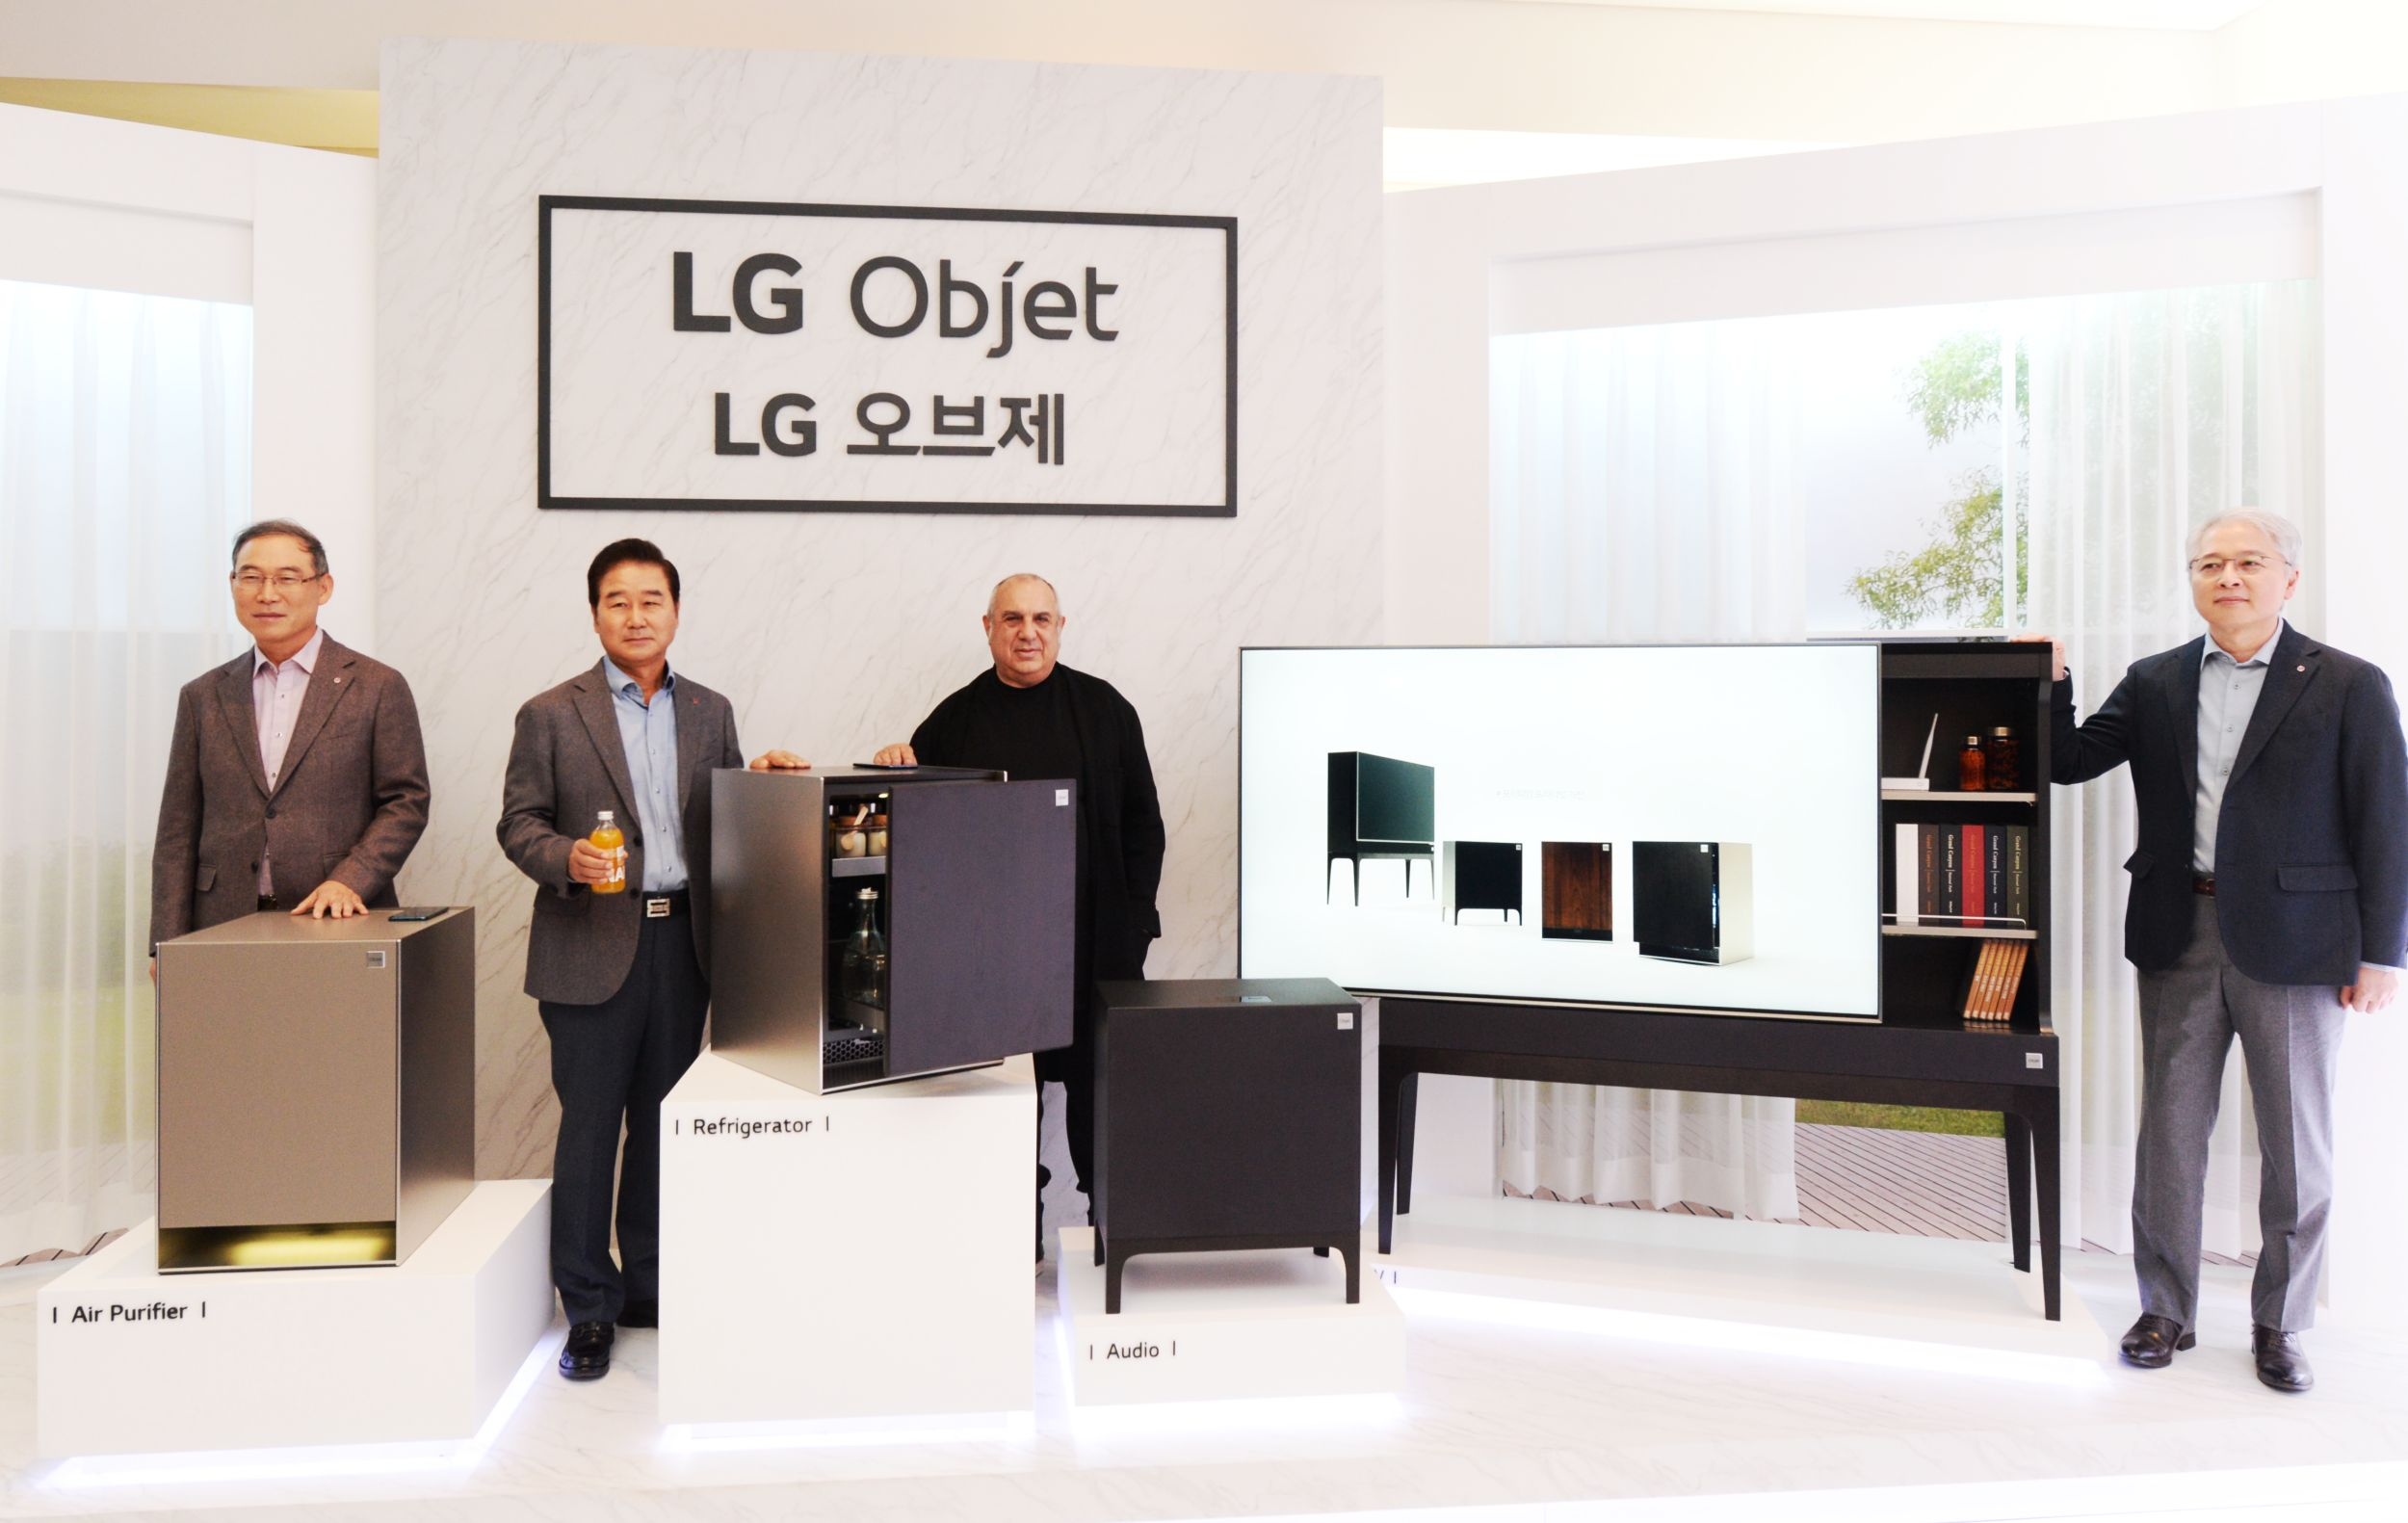 LG전자가 1일 서울 강남구 논현동 모스 스튜디오에서 프리미엄 프라이빗 가전 'LG 오브제' 론칭 행사를 열고, 가전과 가구를 결합한 LG 오브제 제품을 선보였다.